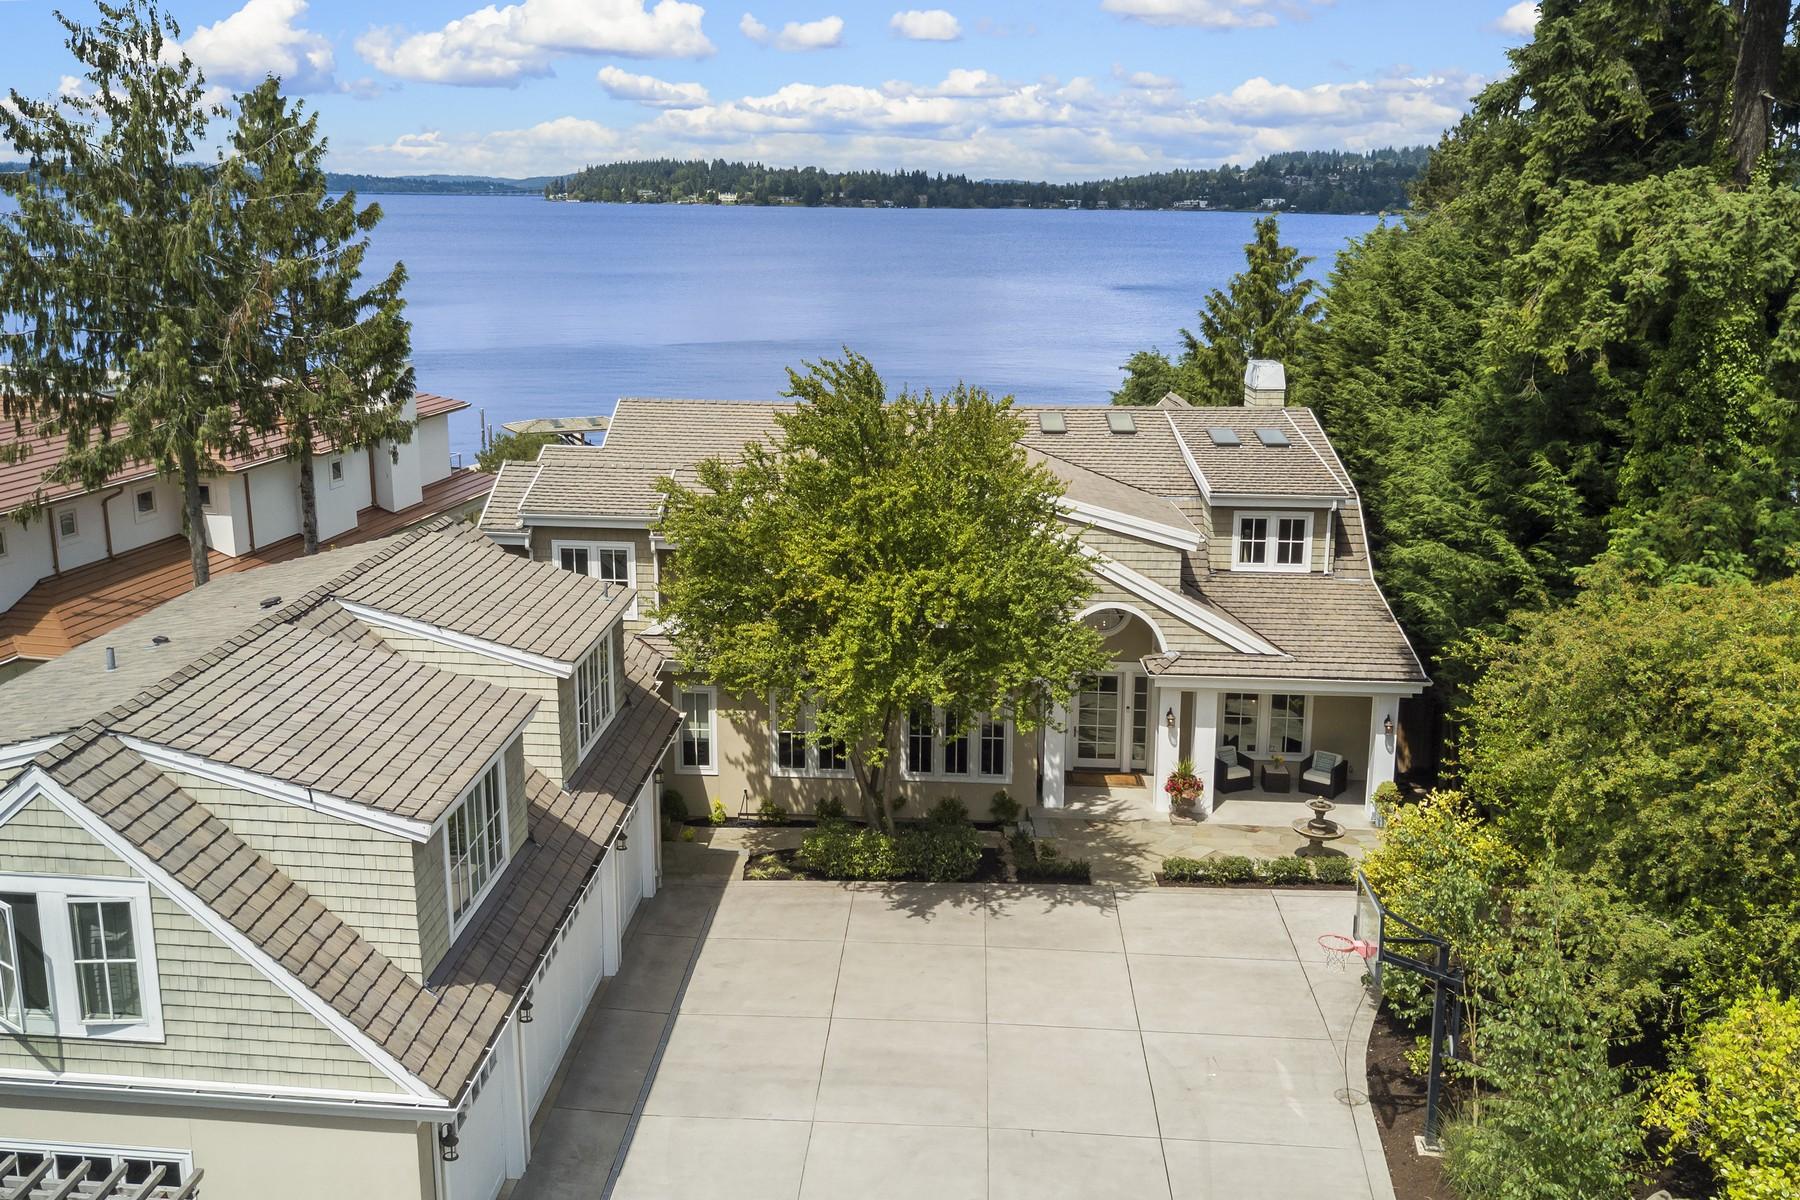 Single Family Home for Sale at Luxury on the Lake 7450 N Mercer Wy Mercer Island, Washington 98040 United States